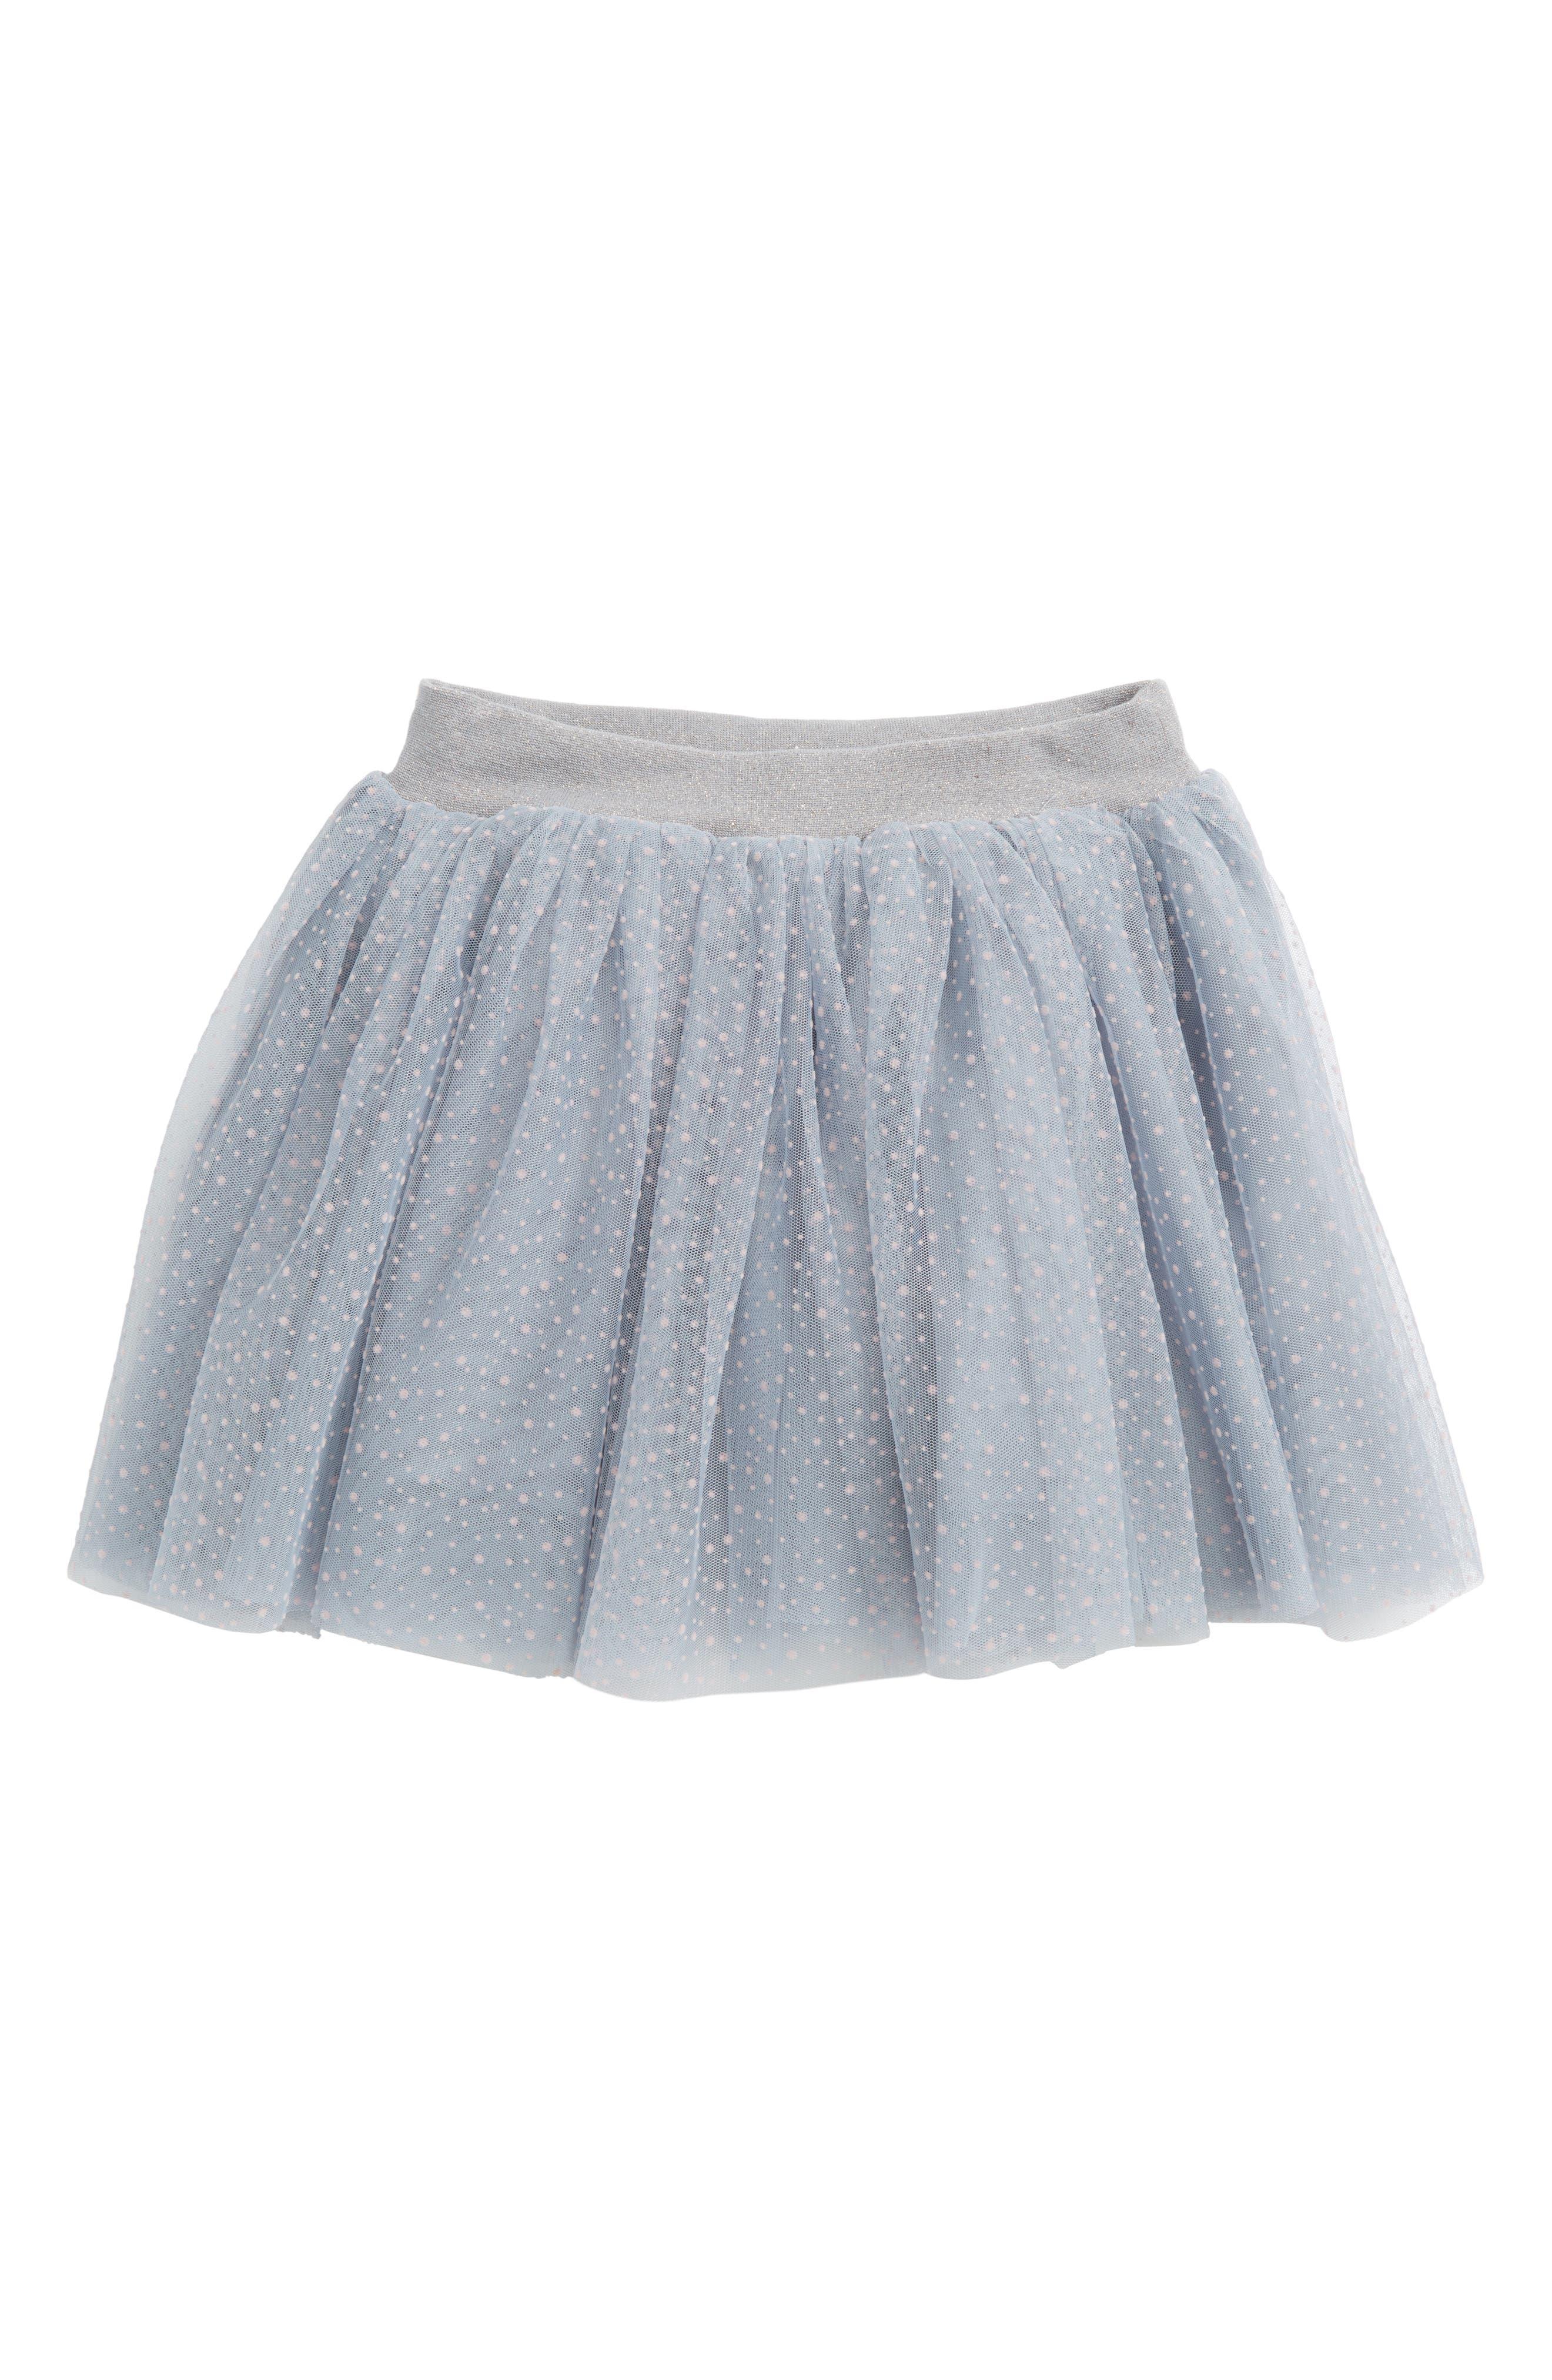 Mina Skirt,                             Main thumbnail 1, color,                             020